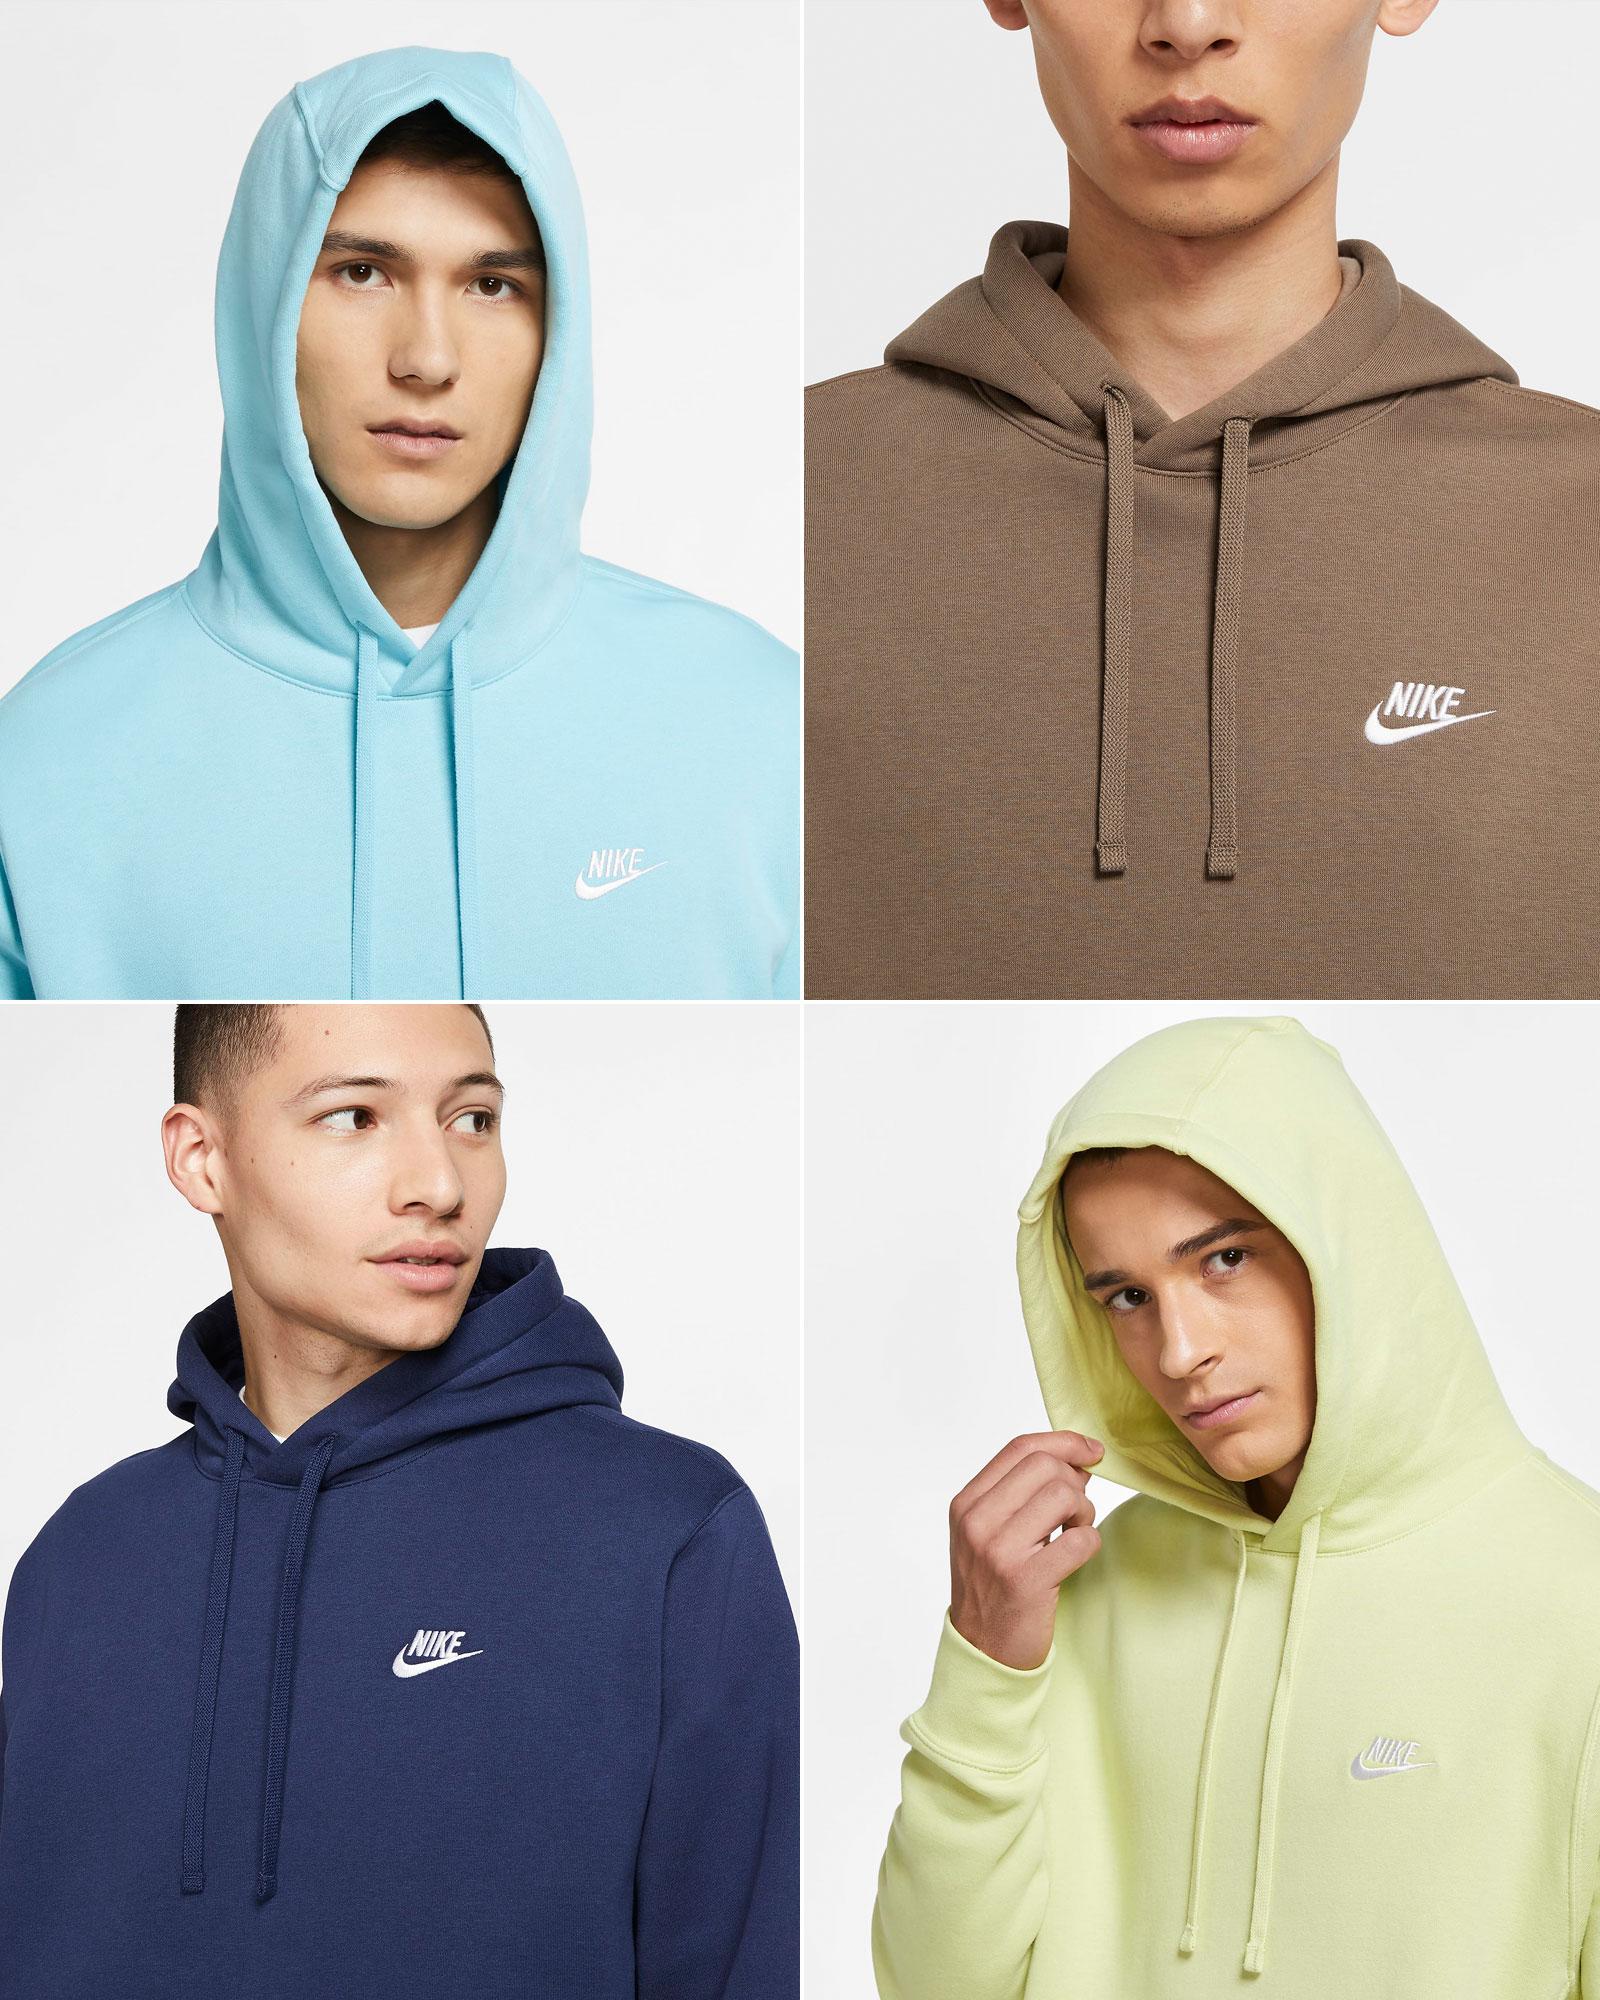 jordan-1-bio-hack-hoodies